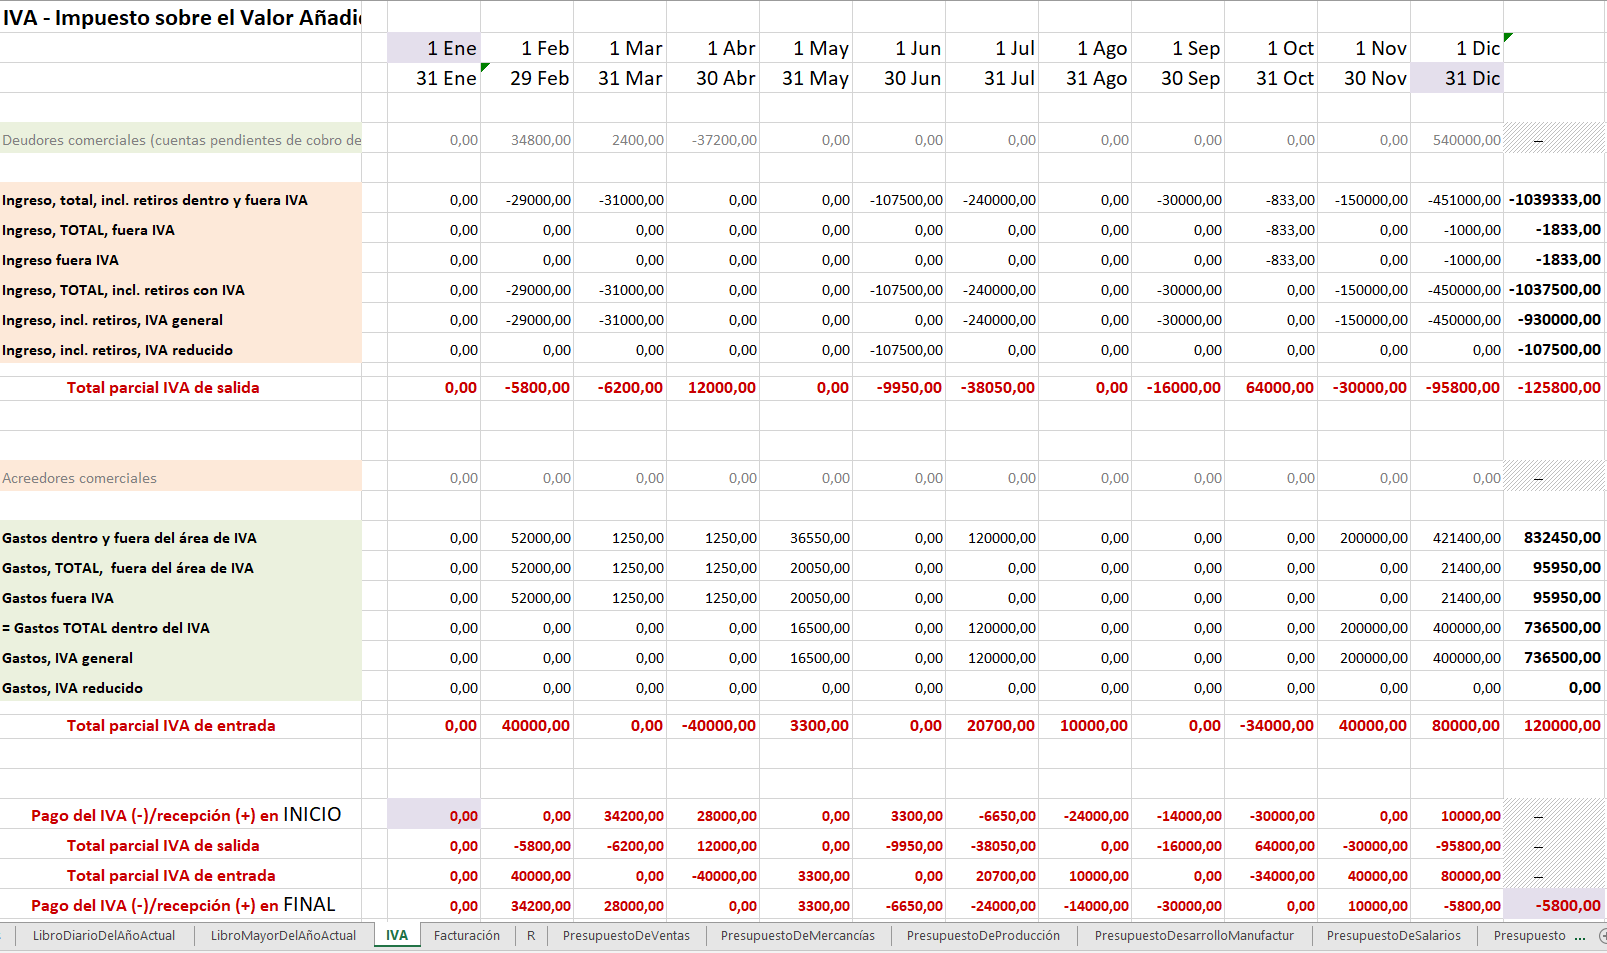 1542636669_es35a__IVA_de_impuestos__Excel-Accounting-Budget-Analysis.com__2018-11-18.png